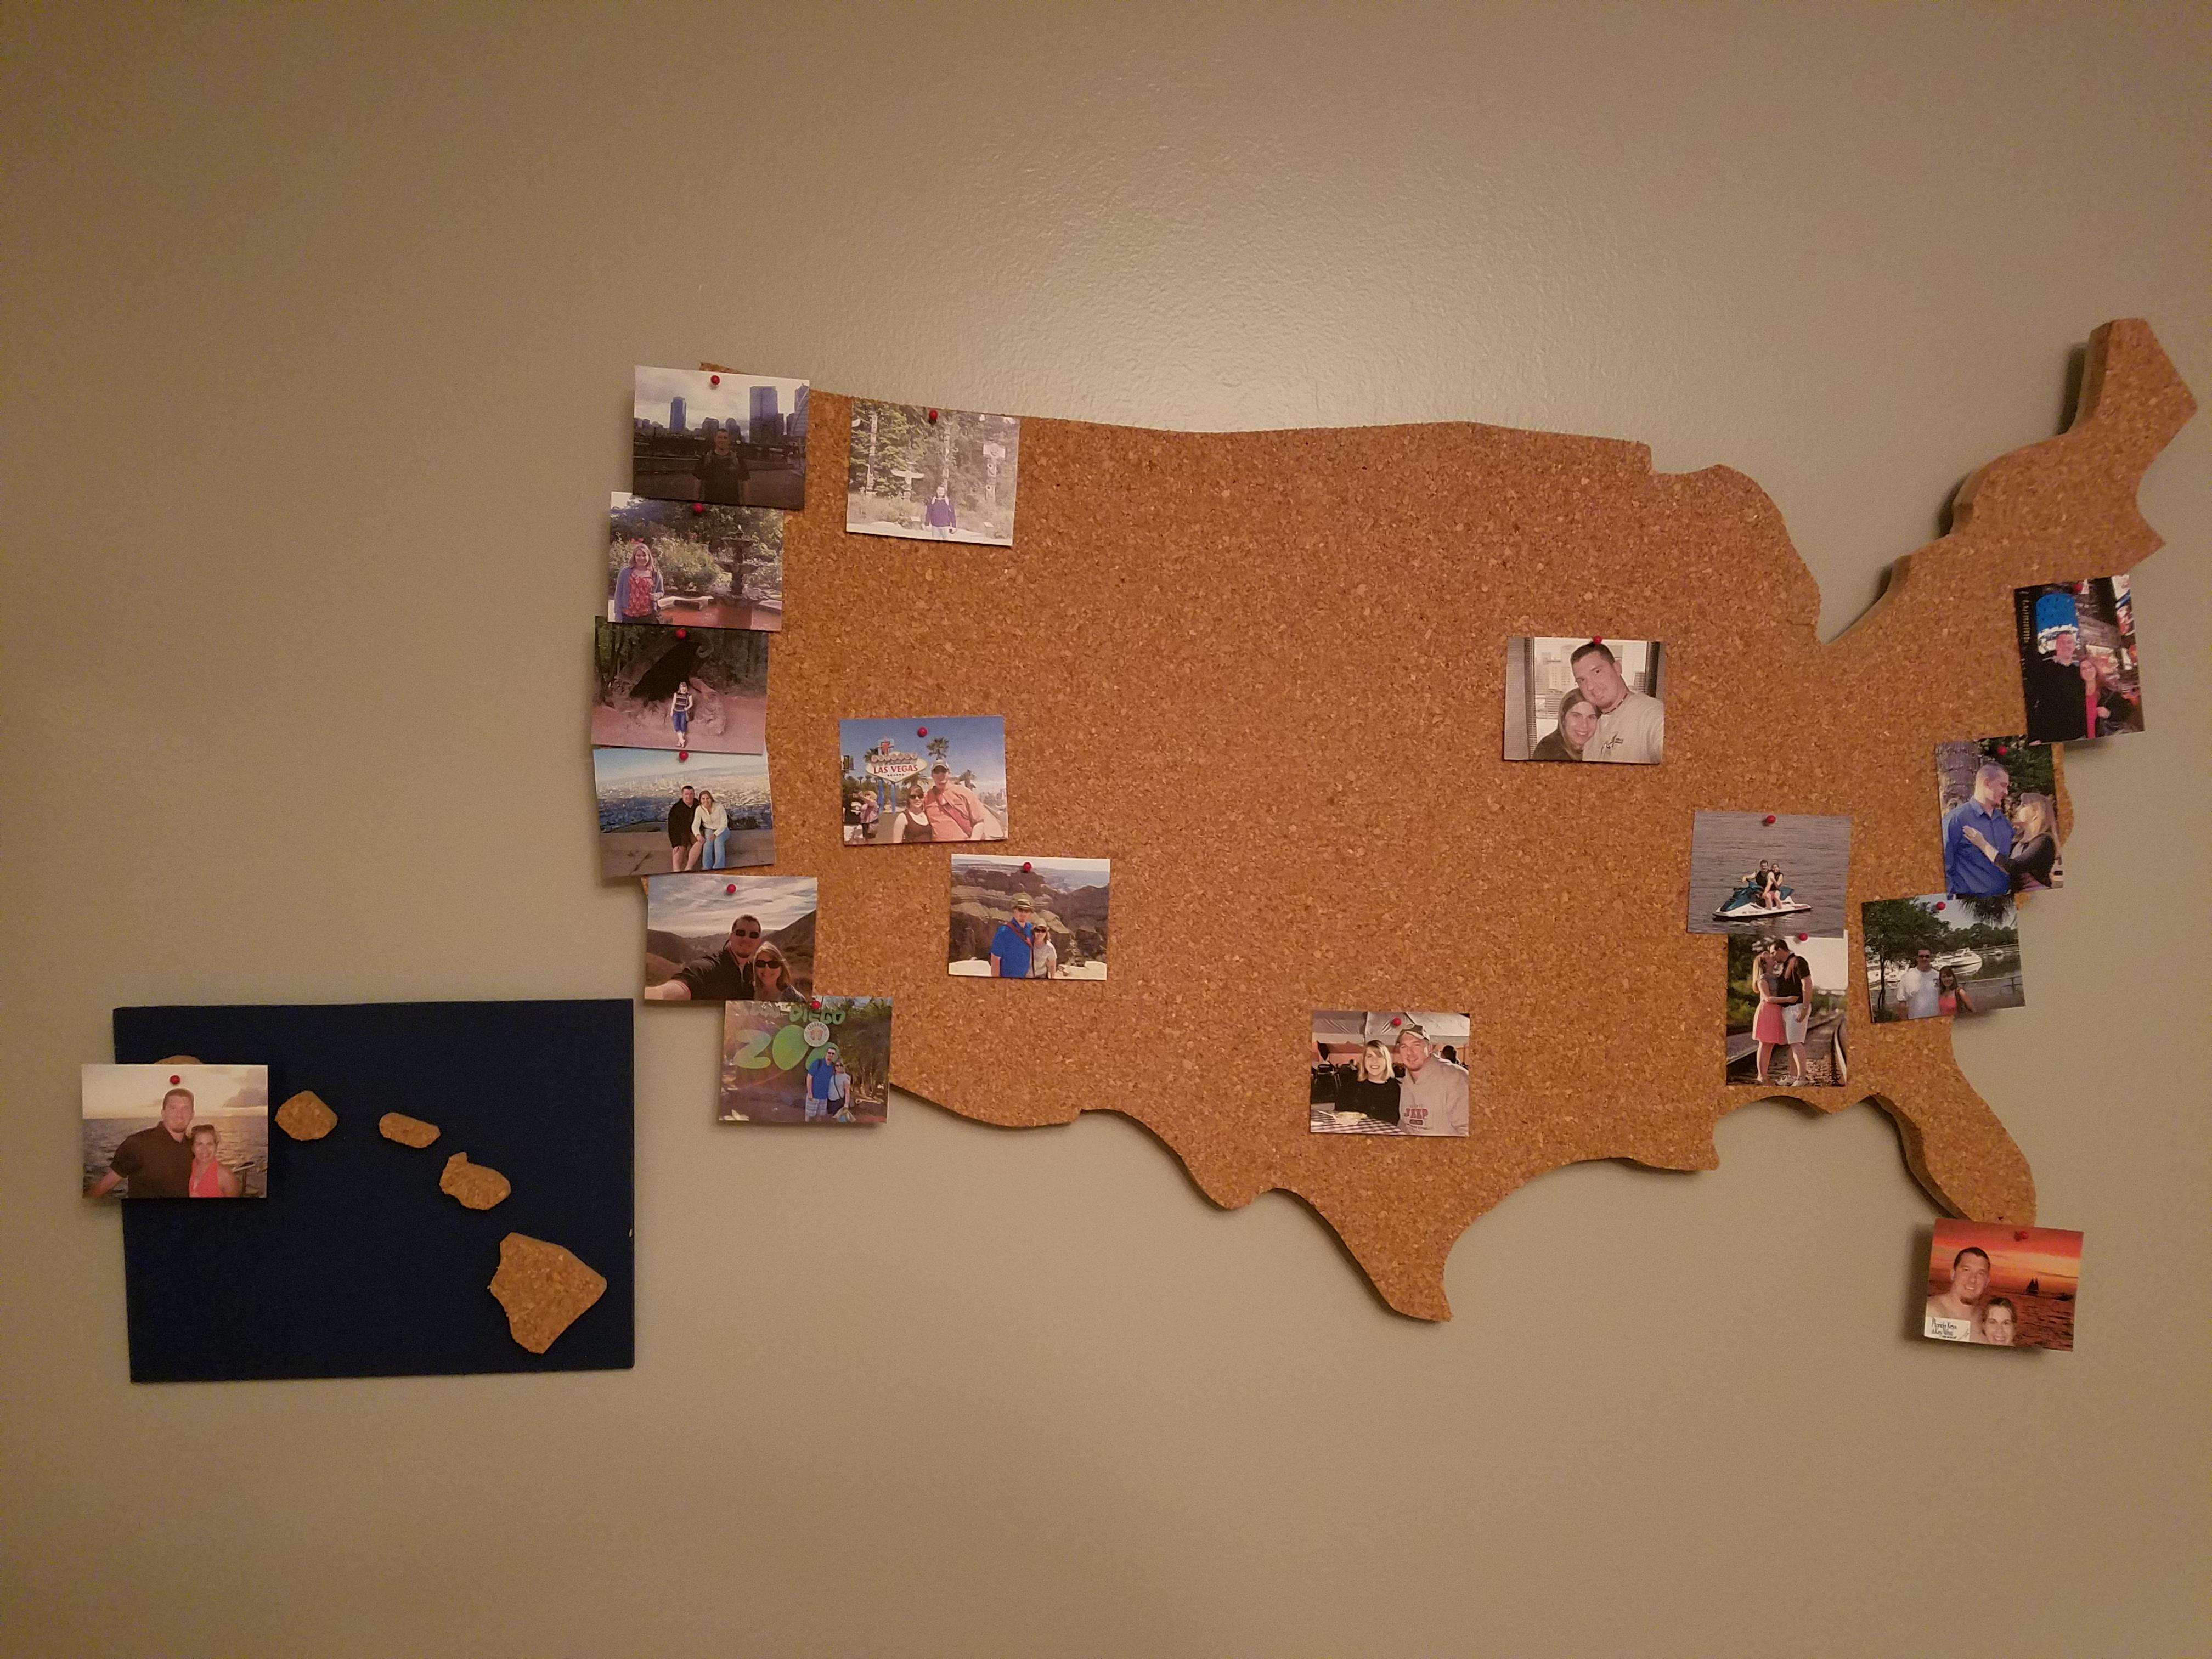 united states map cork board Diy Cork Board Map Of United States Piecesofapriljournalistblog